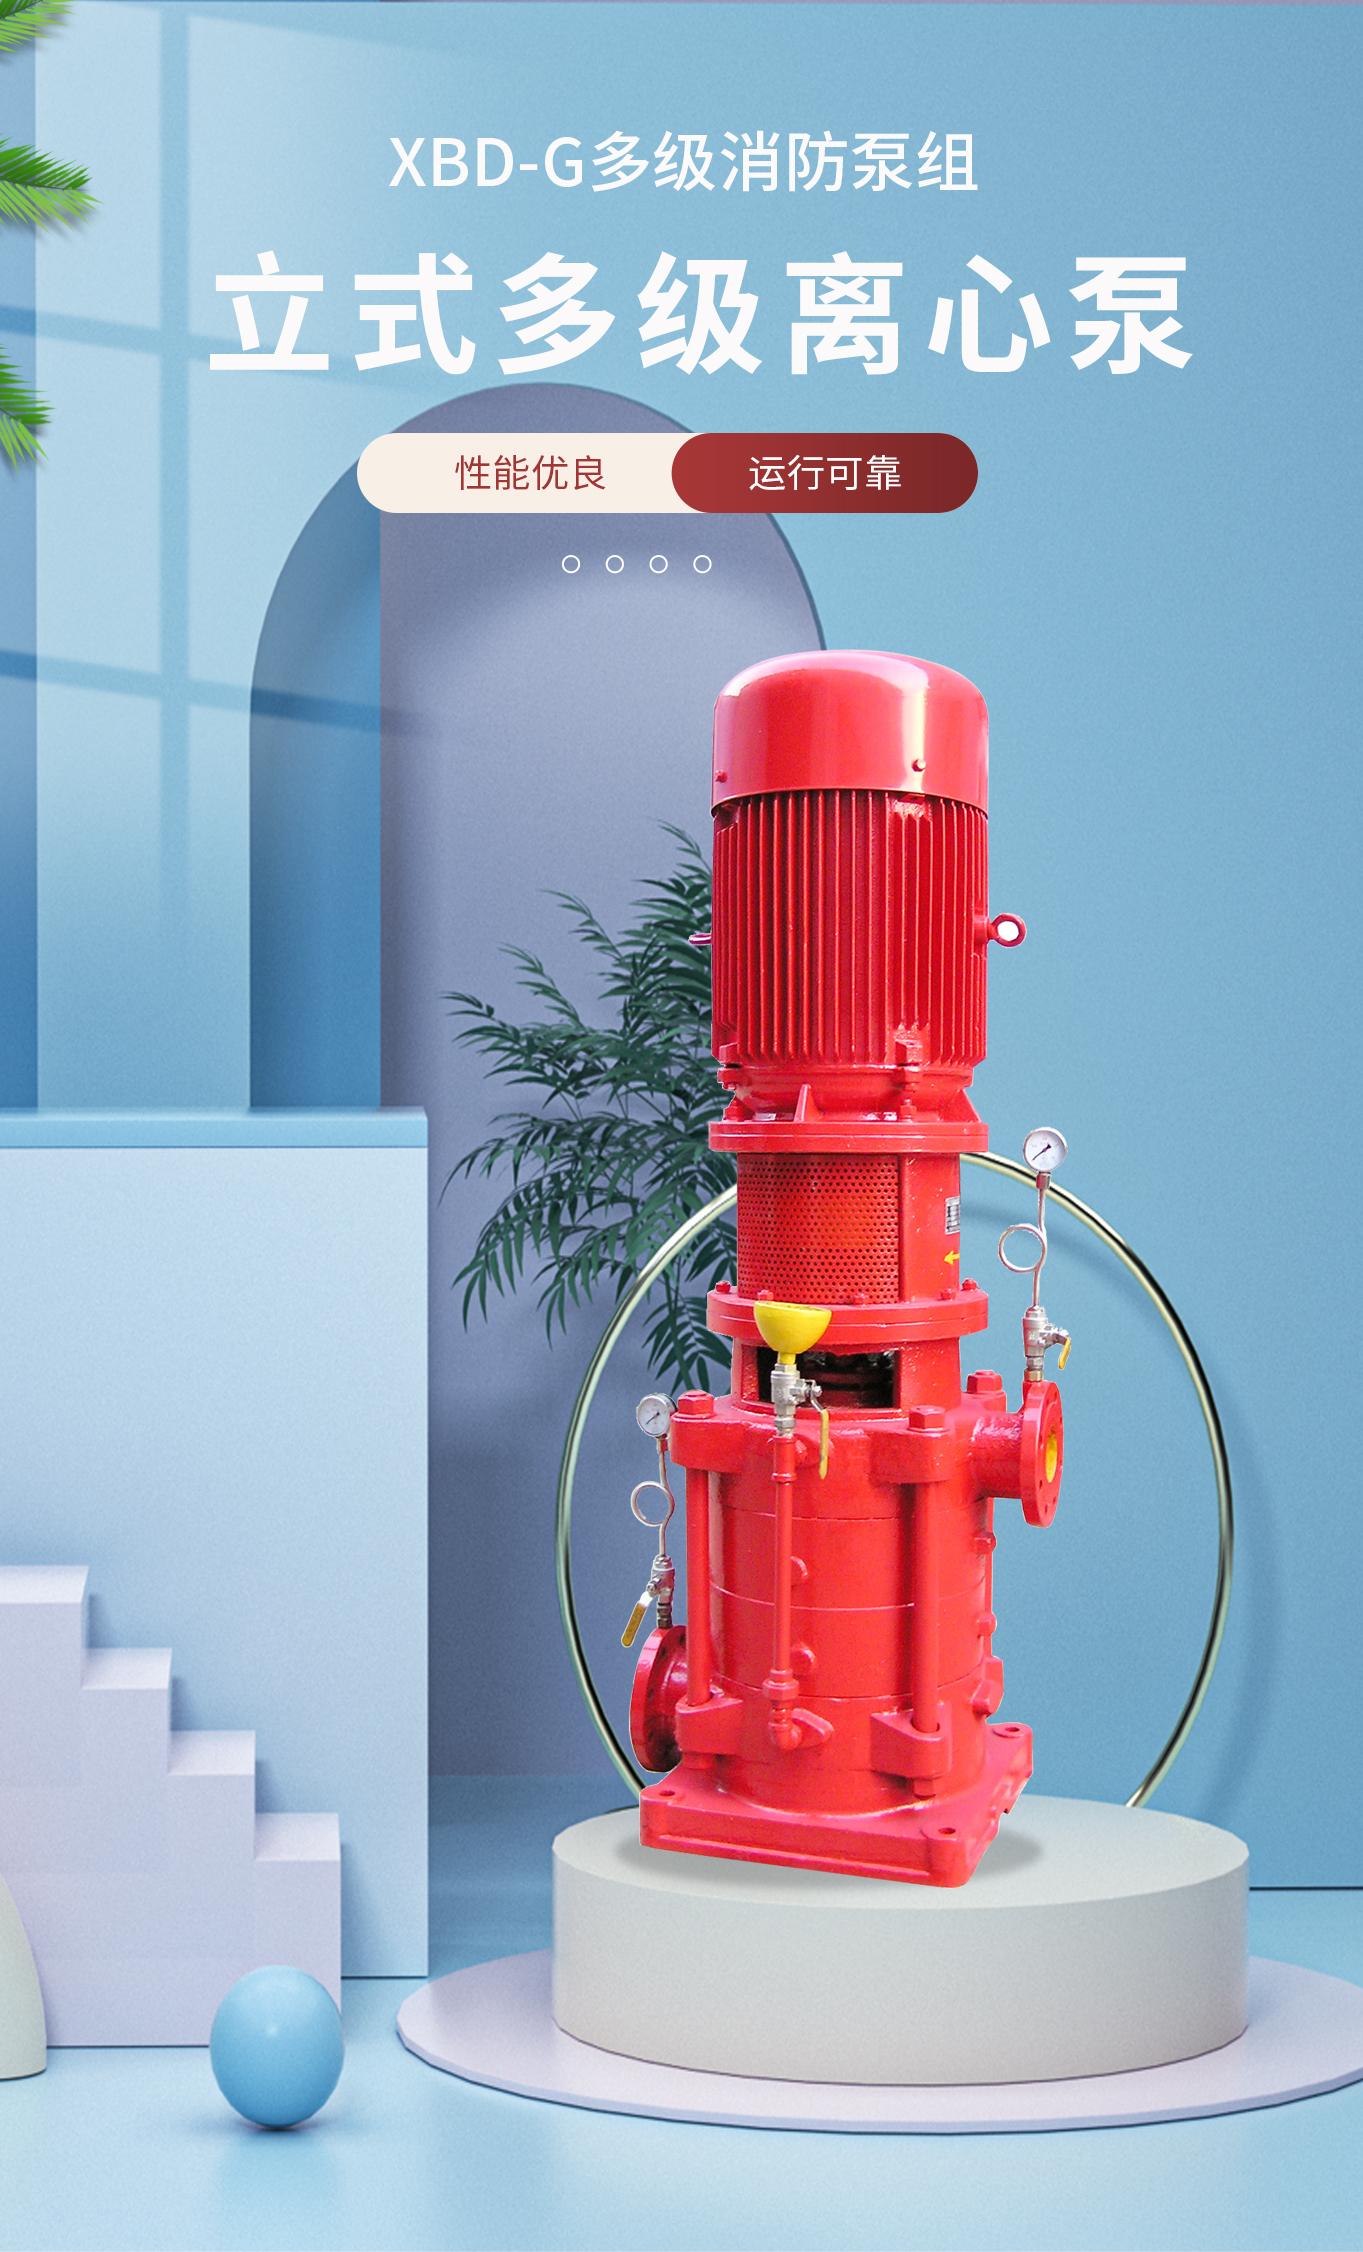 XBD-G型立式多级消防泵组_01.jpg